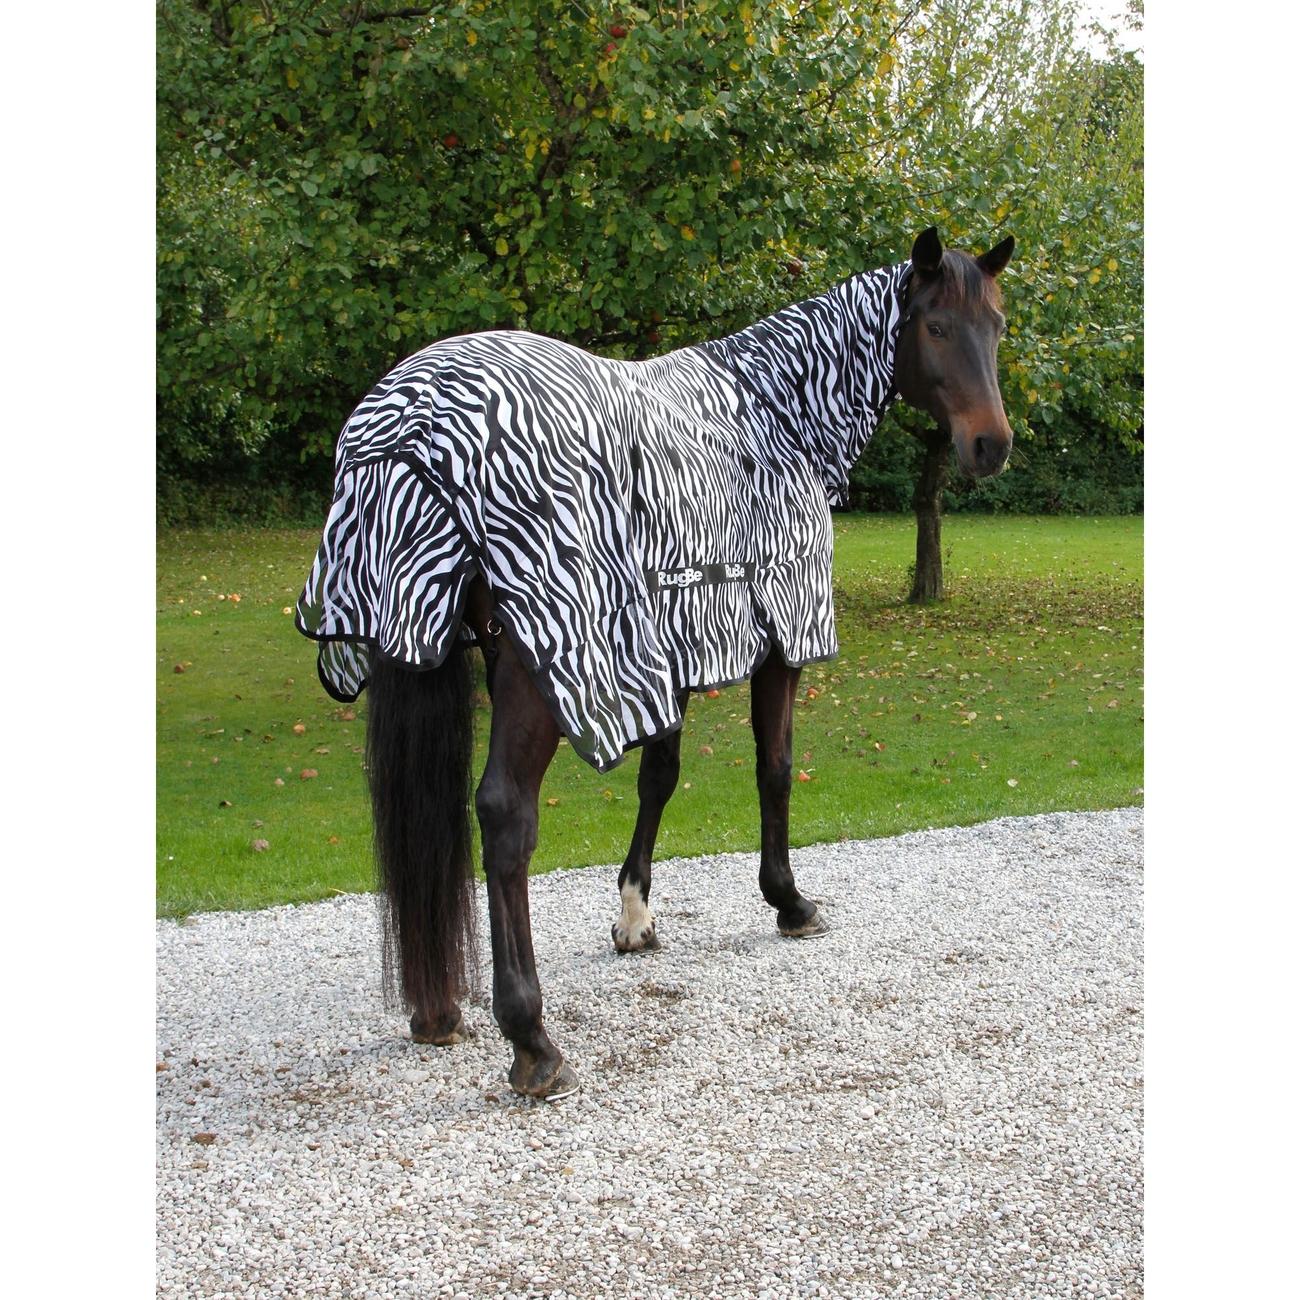 Covalliero RugBe Ekzemerdecke Zebra, Bild 2